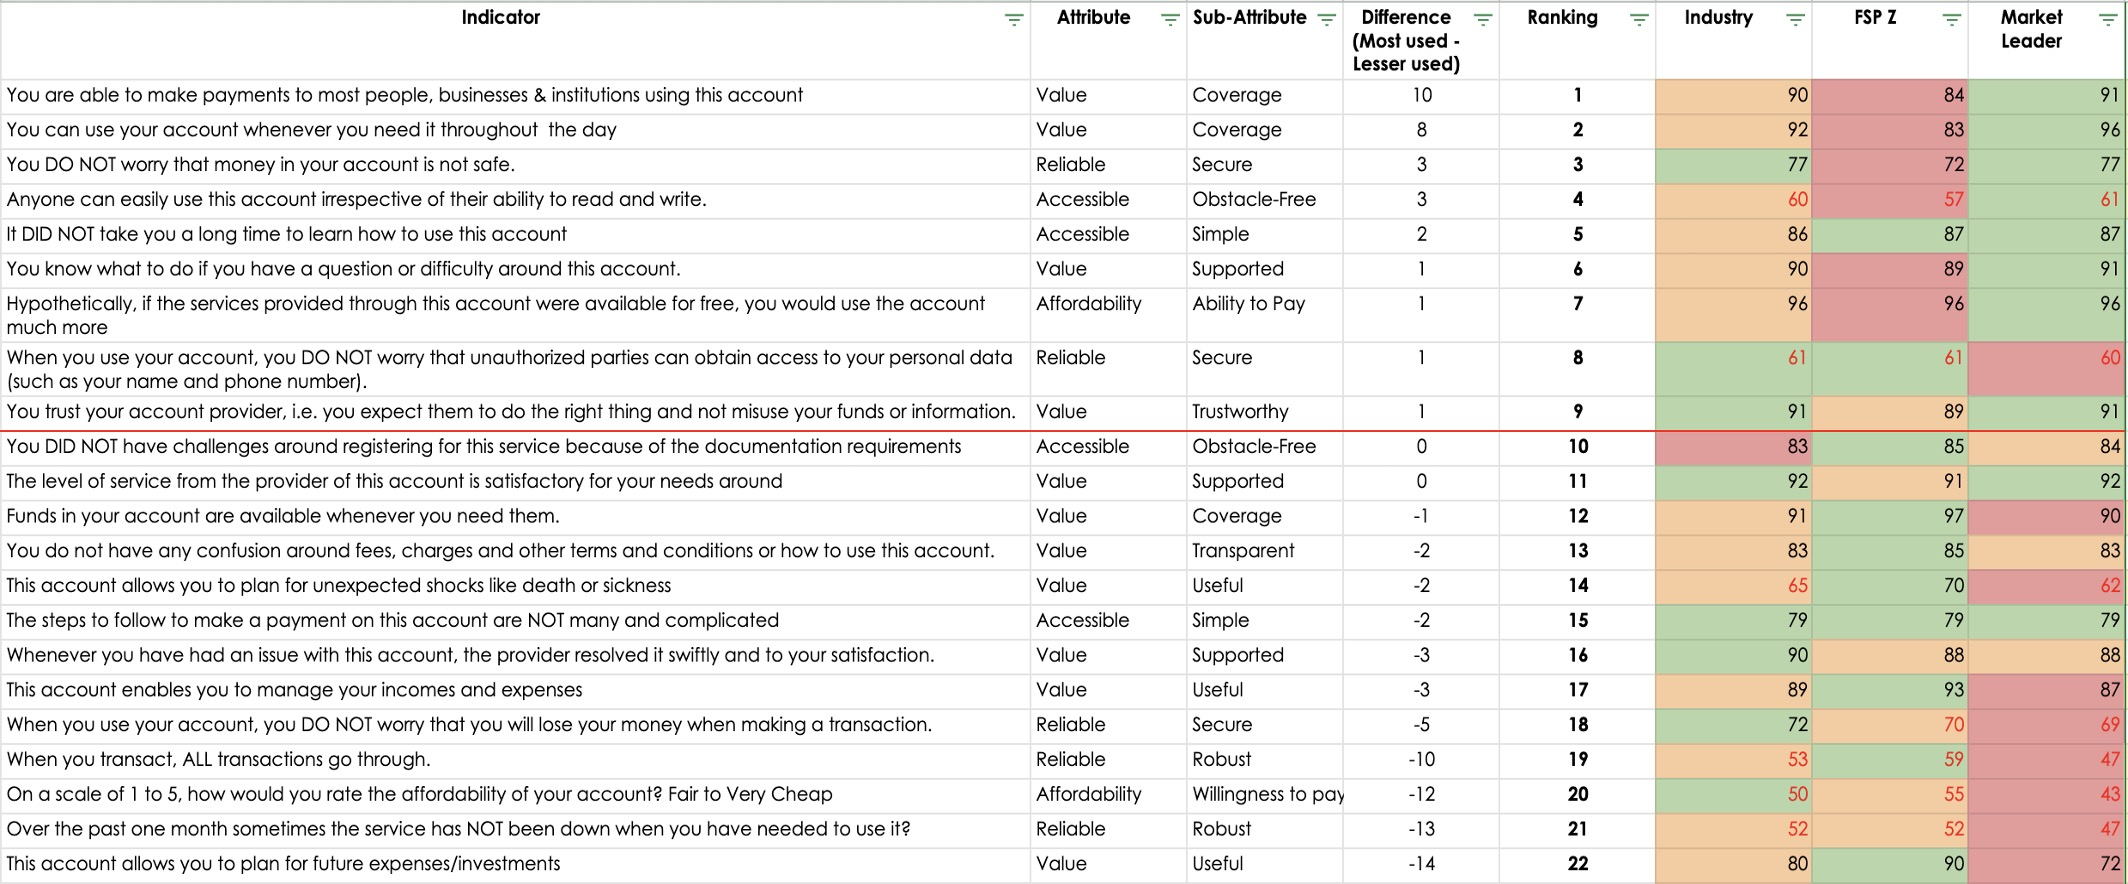 BFA Global measuring inclusiveness comparison of attributes across FSPs in Kenya